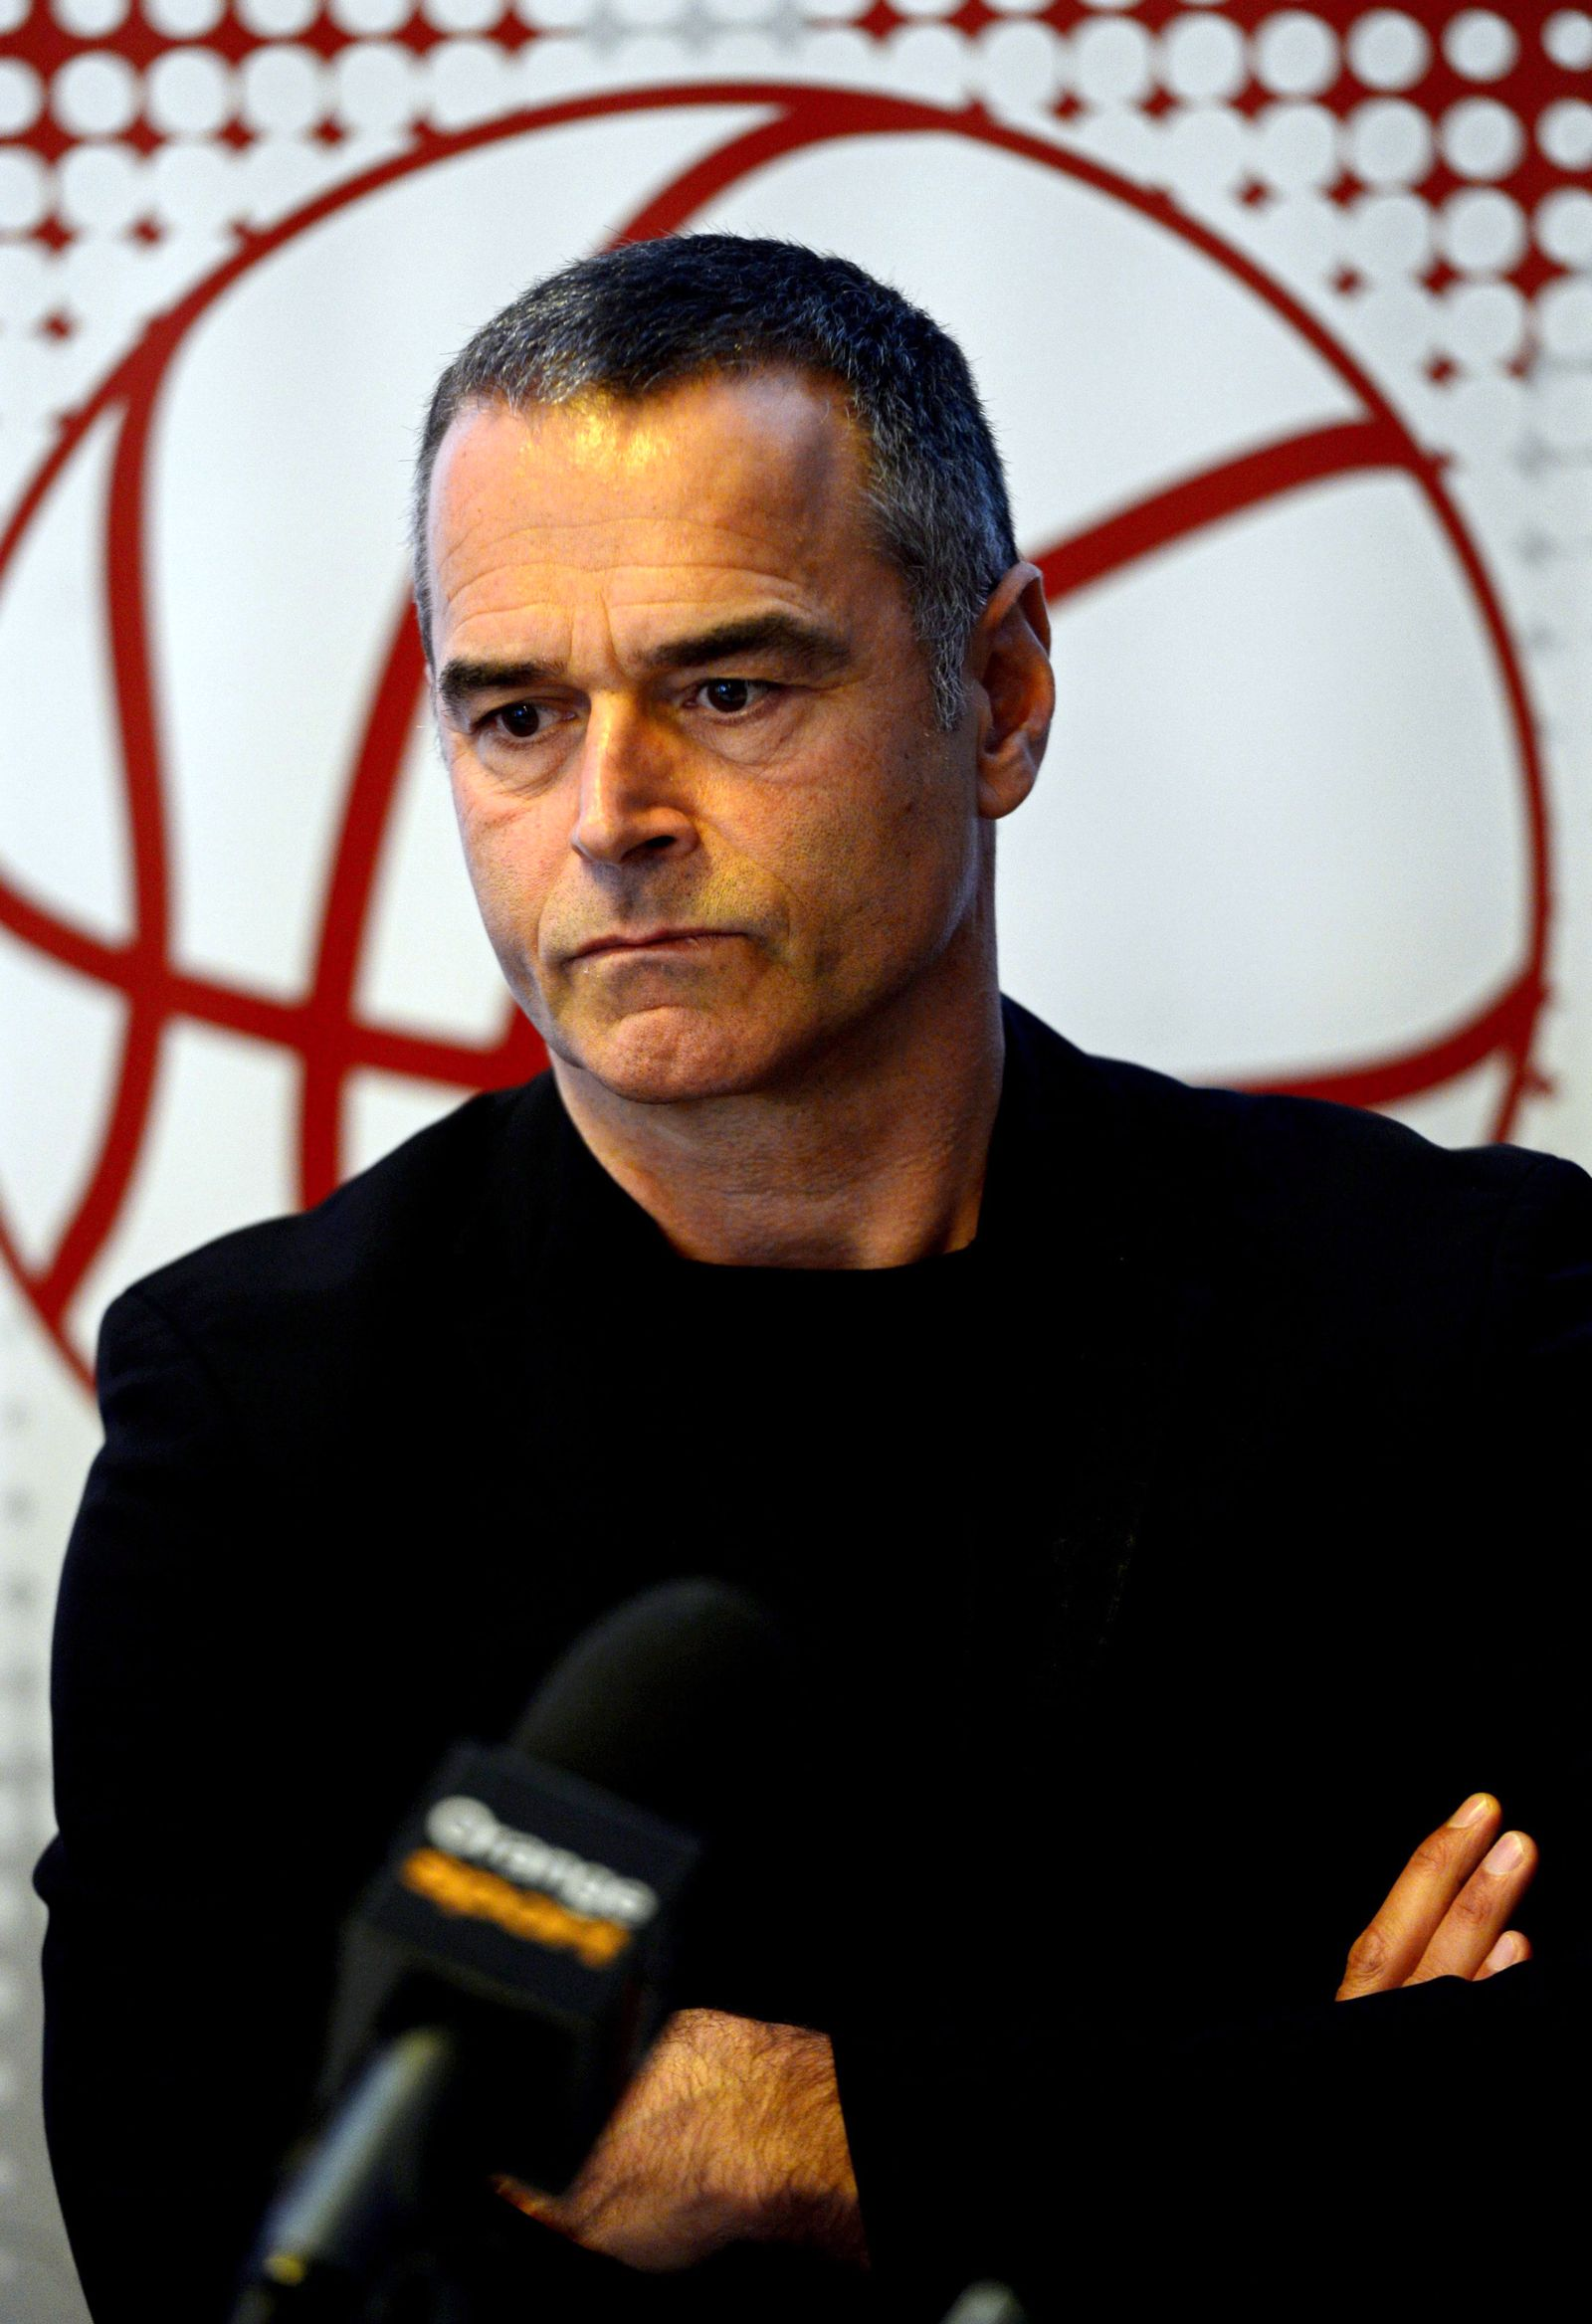 New head coach of the Polish national basketball team Dirk Bauerm